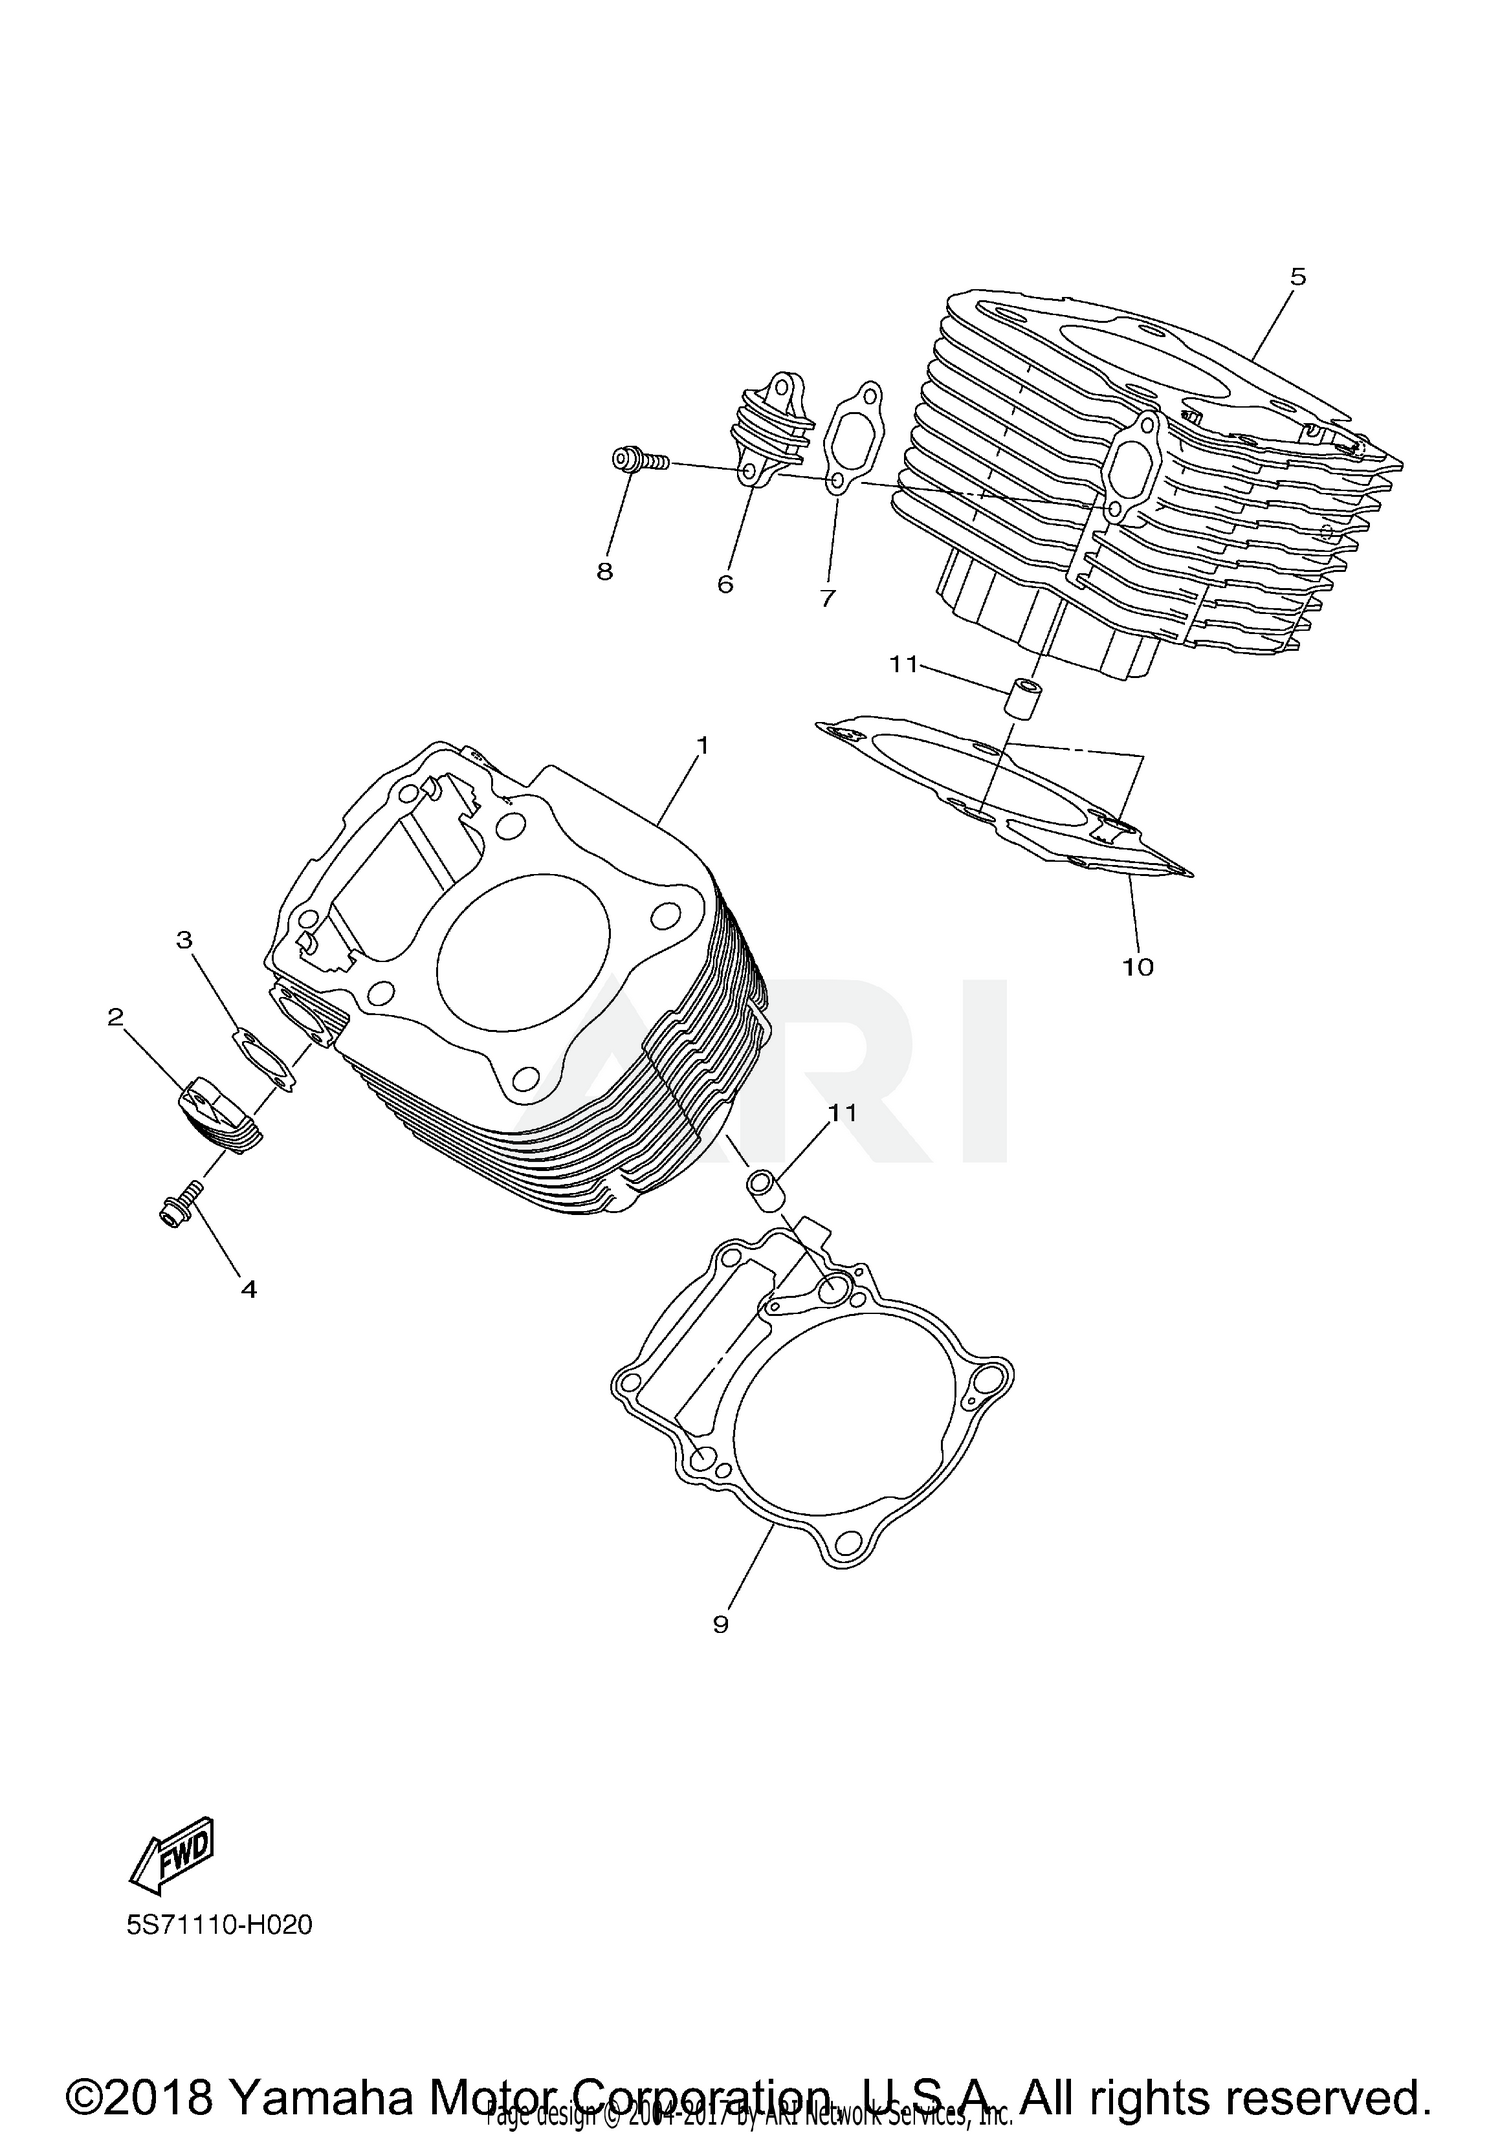 2018 yamaha bolt r spec xvs95cjcl cylinder parts best Yamaha Banshee Wiring-Diagram schematic search results parts in schematics